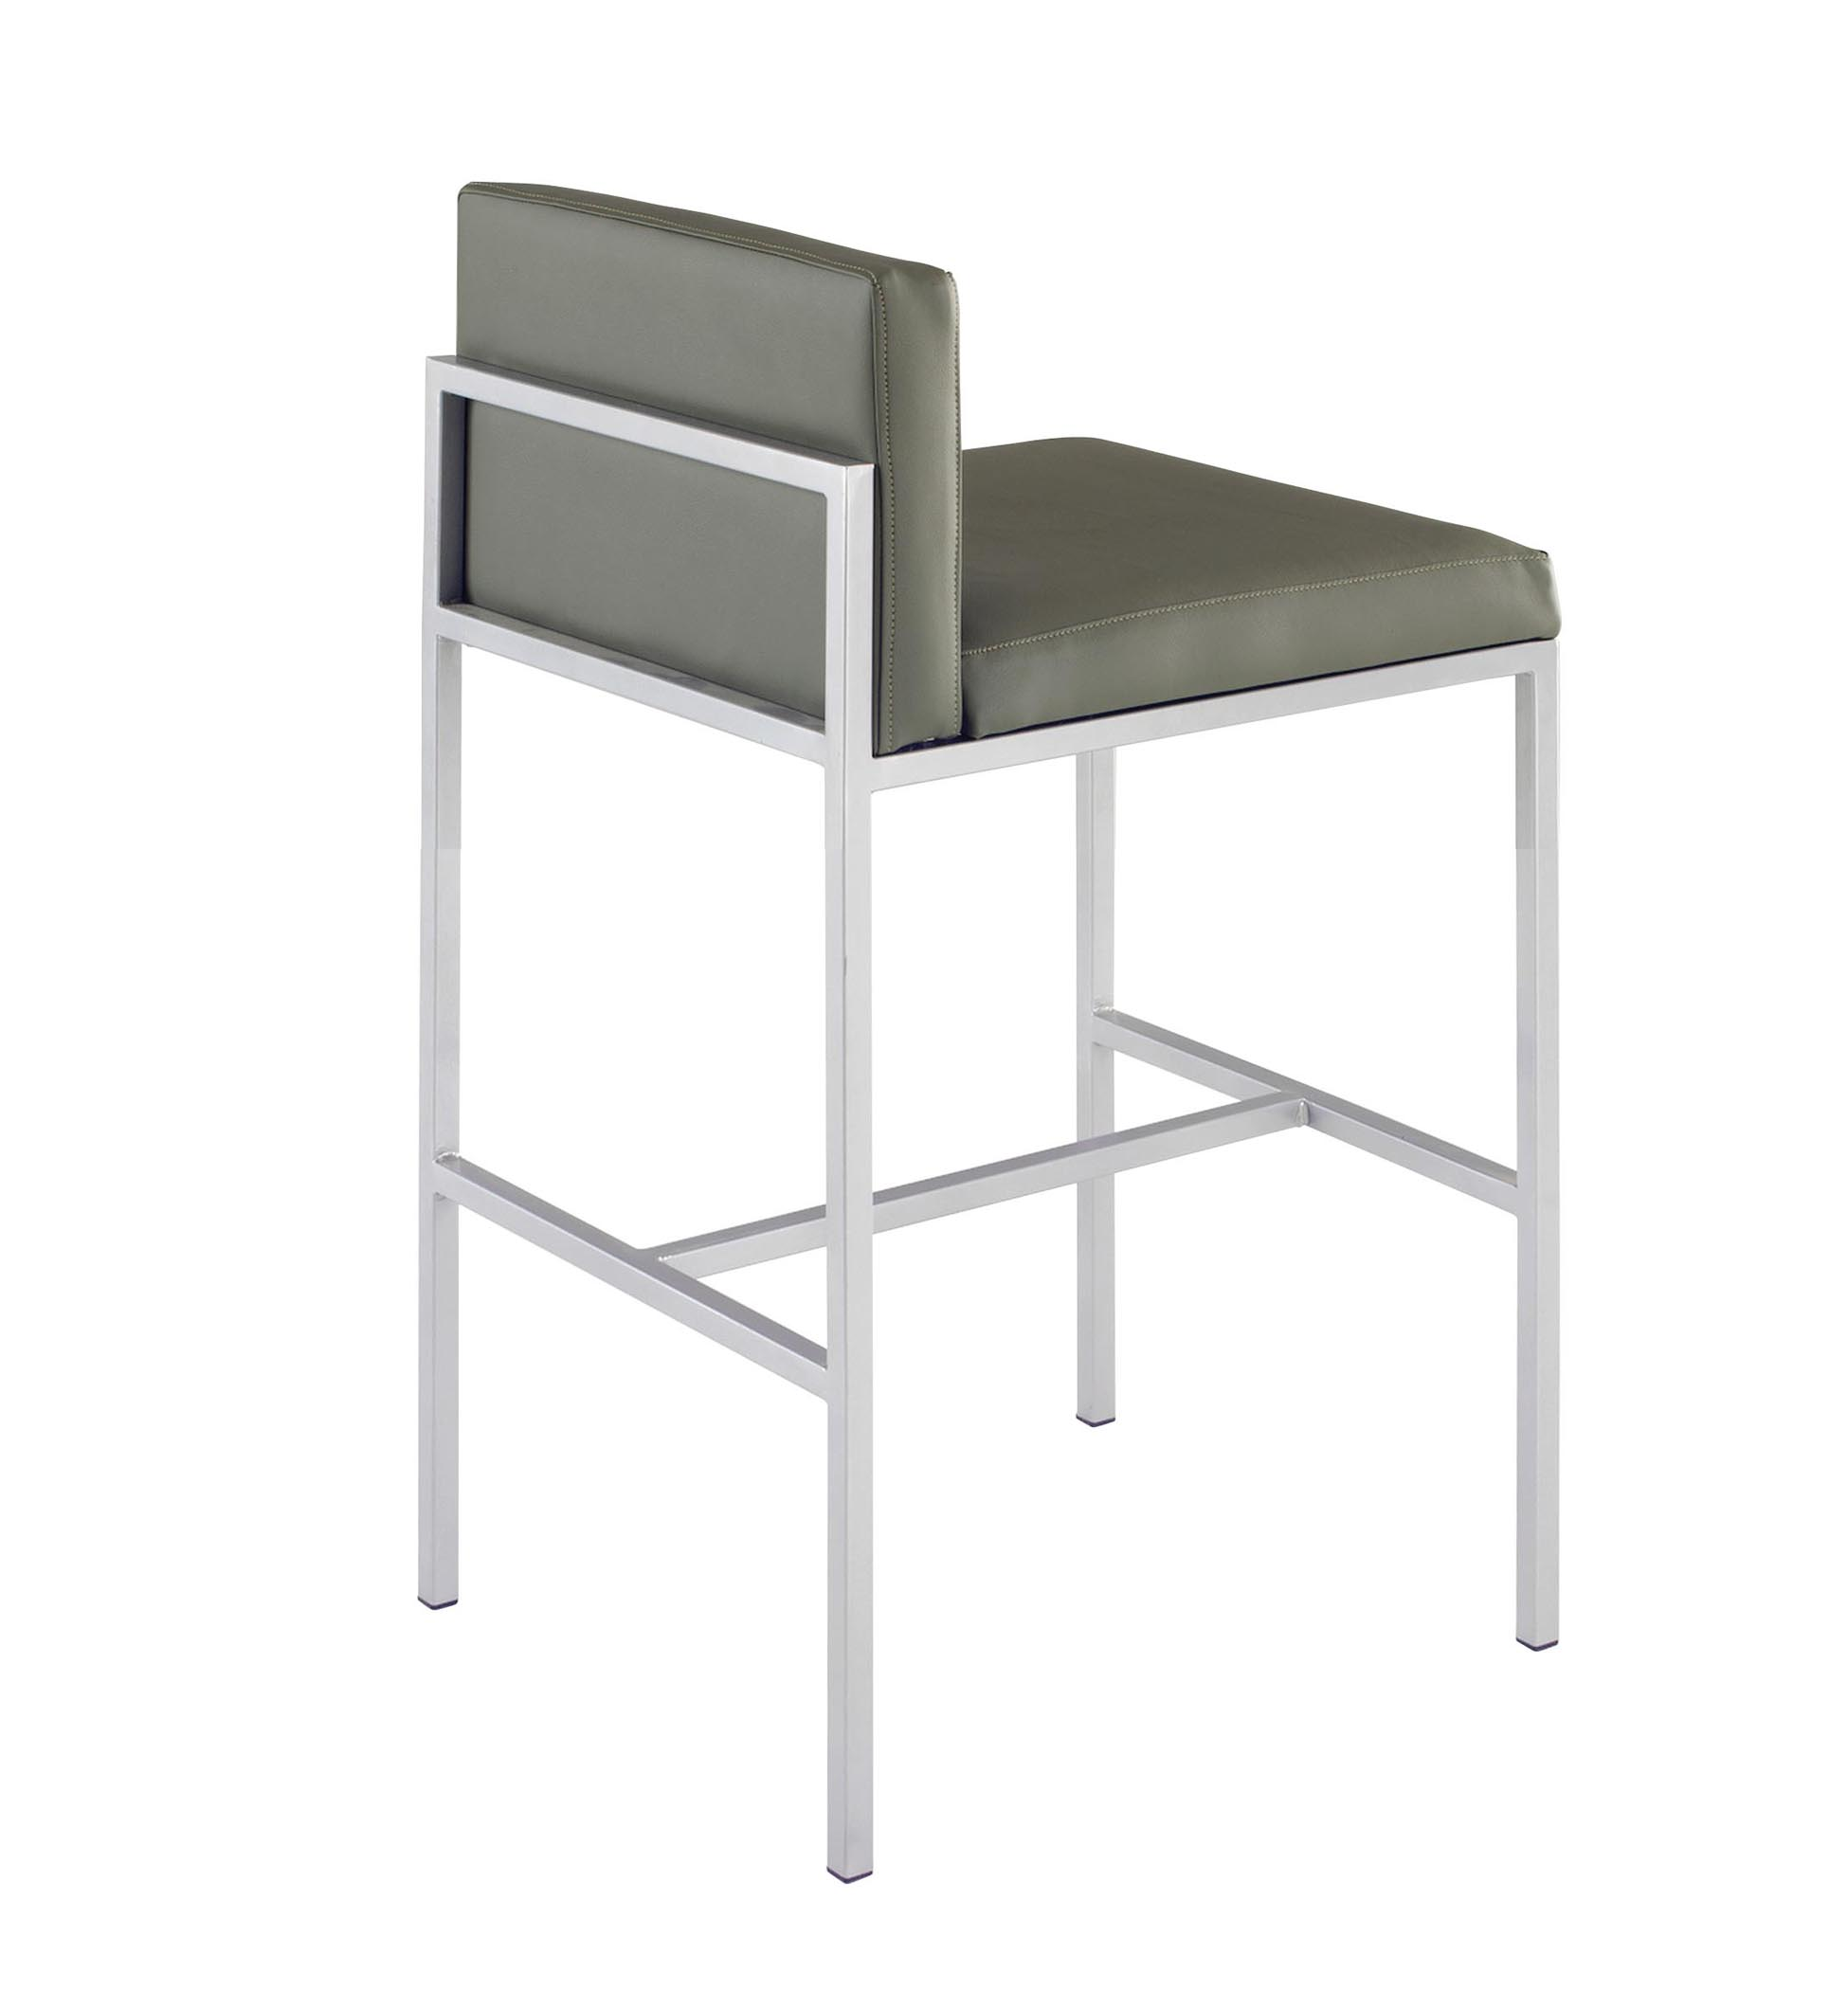 Awe Inspiring Metal Counter Stool Pabps2019 Chair Design Images Pabps2019Com